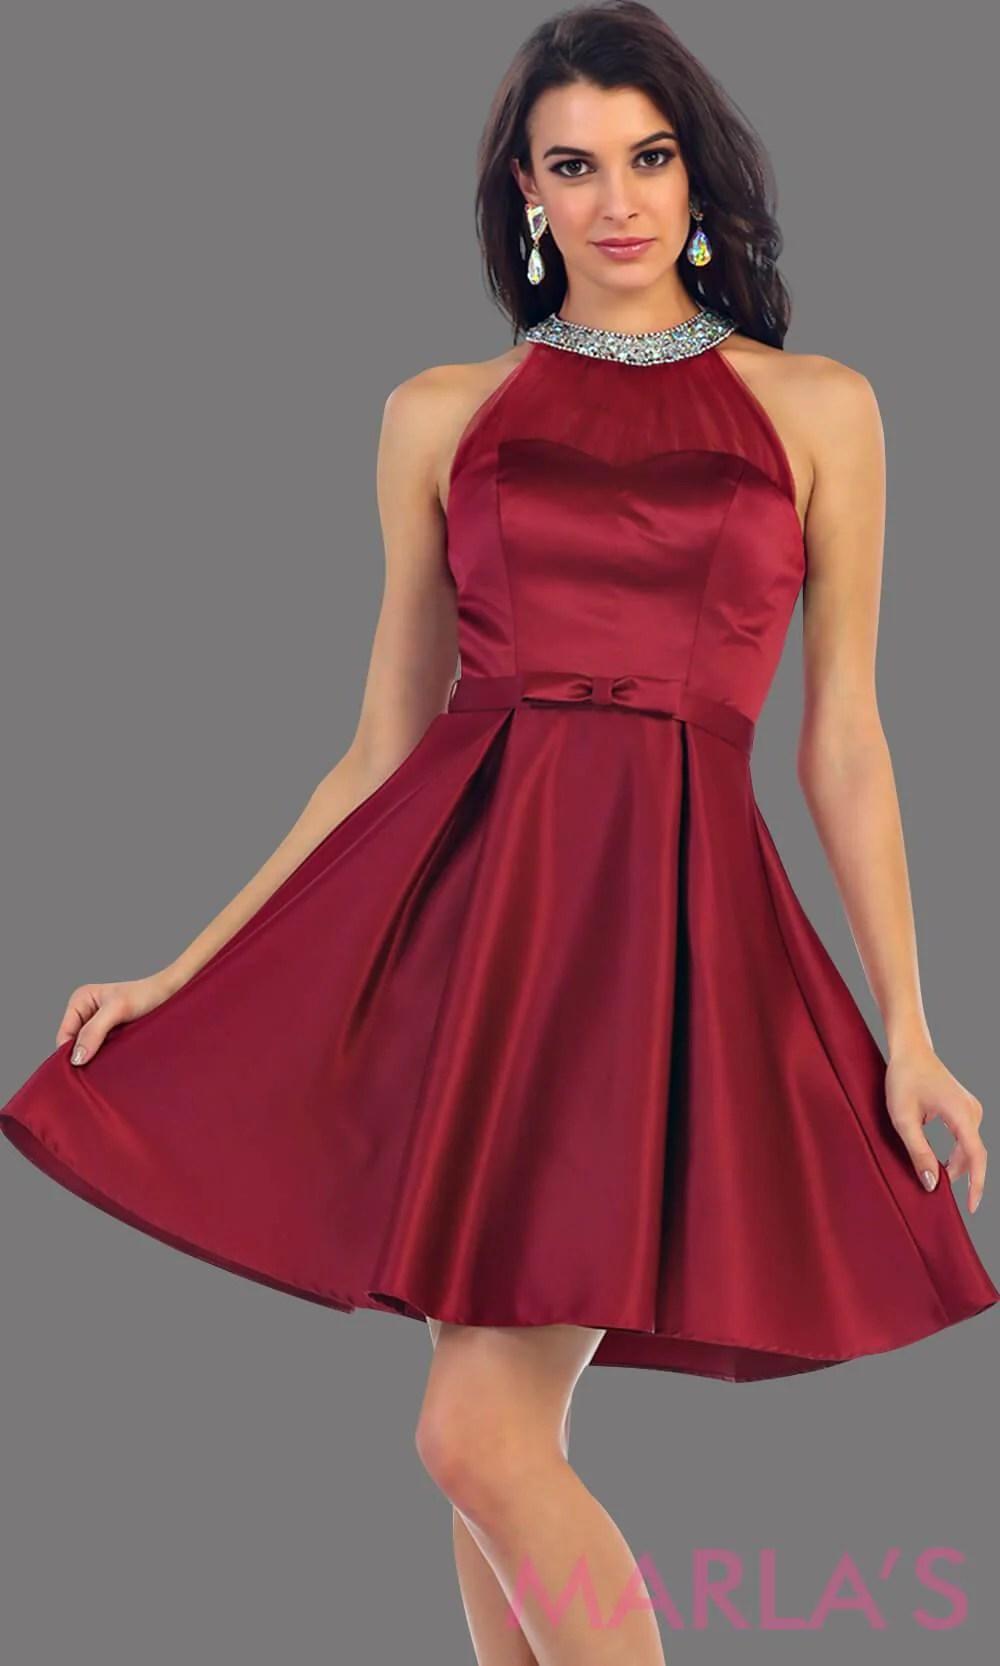 Short High Neck Bridesmaid Dress Burgundy